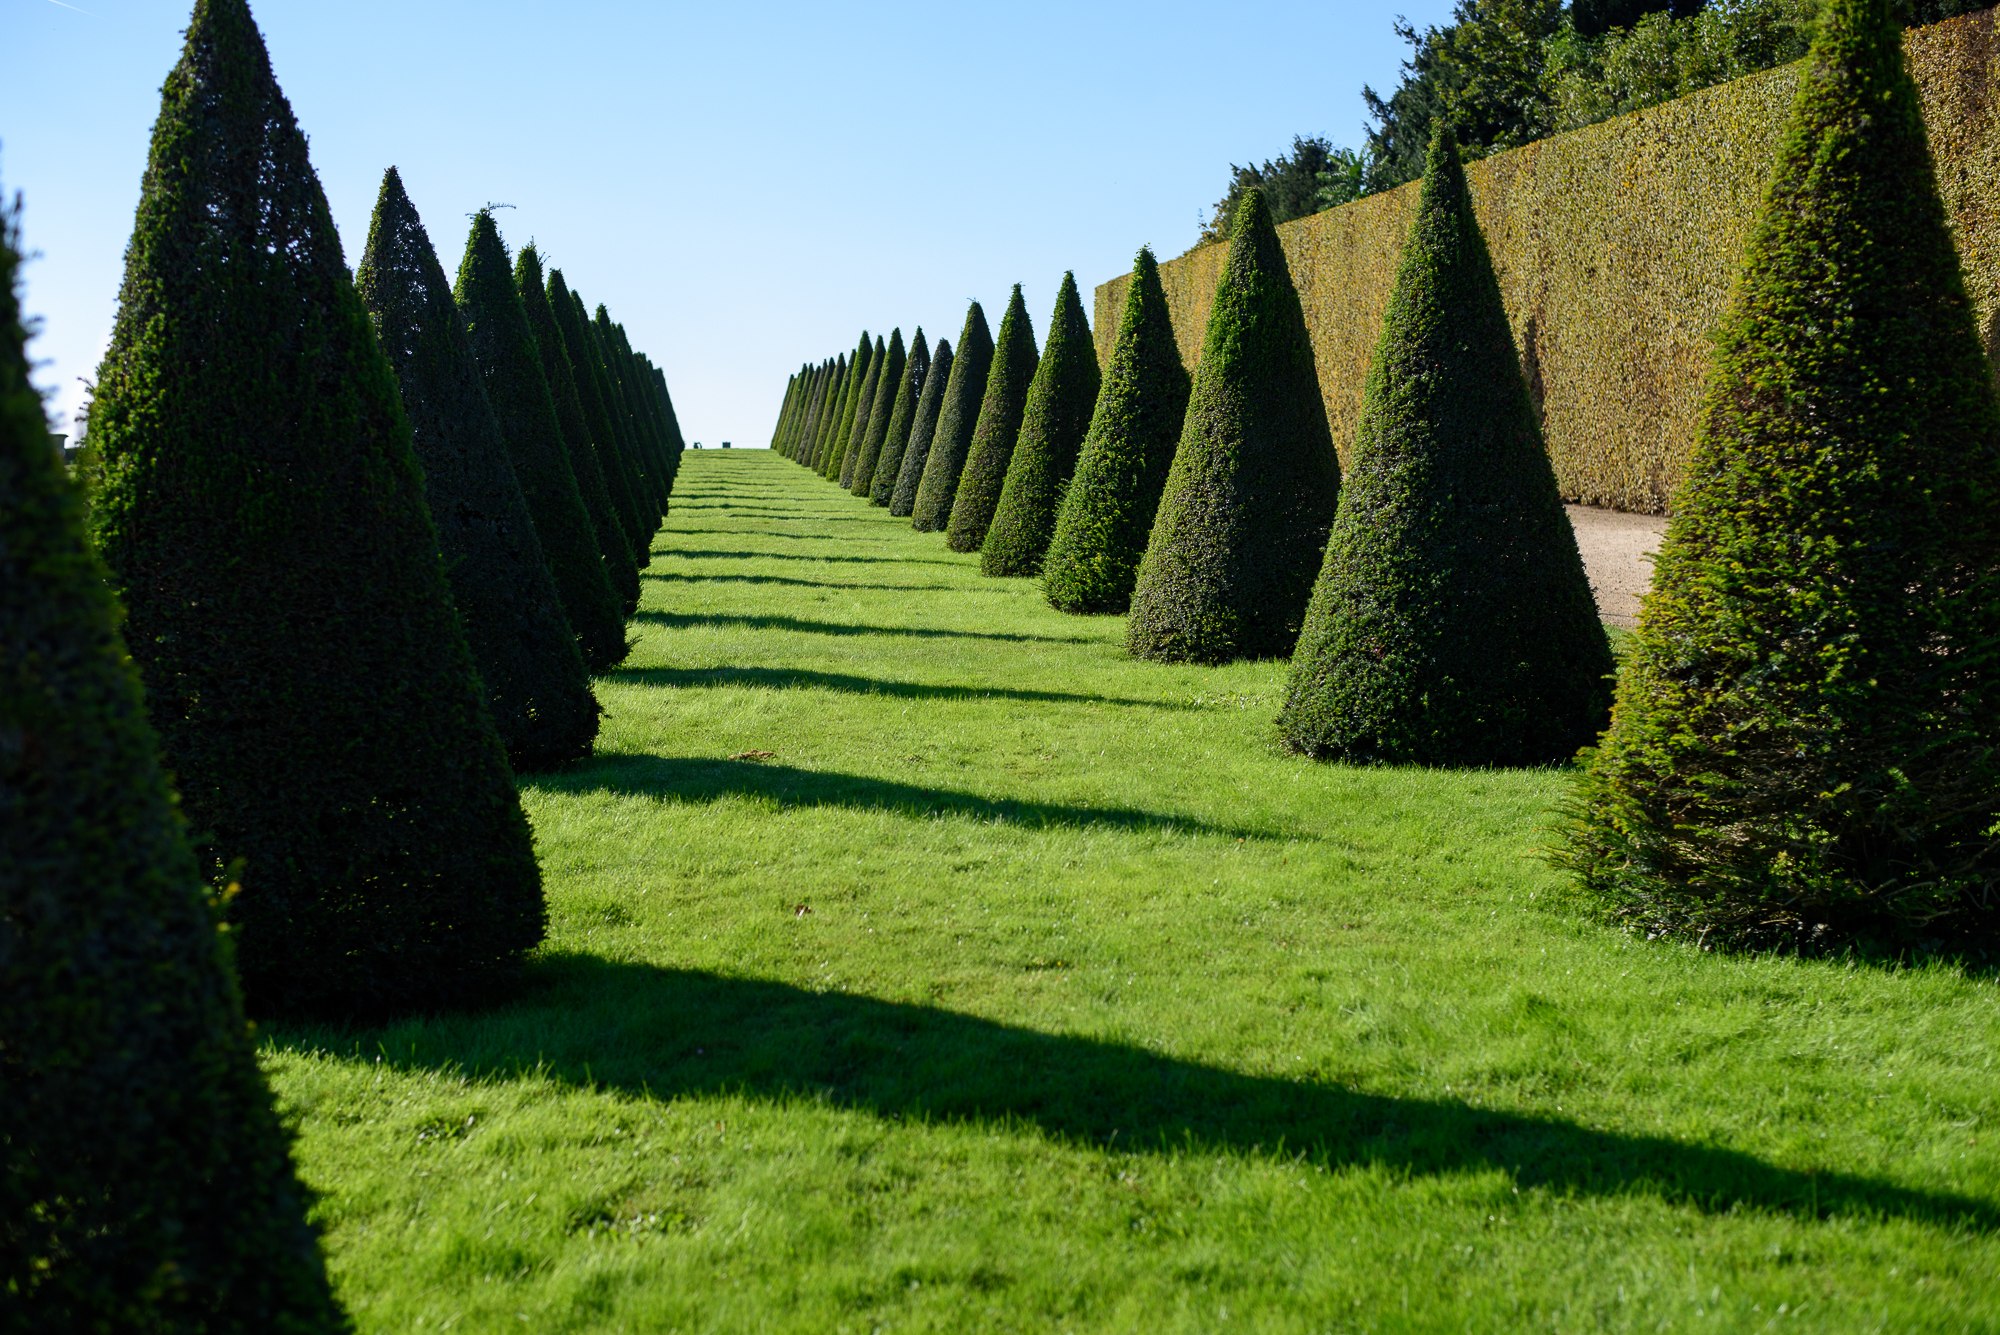 palace-of-versailles-garden-2